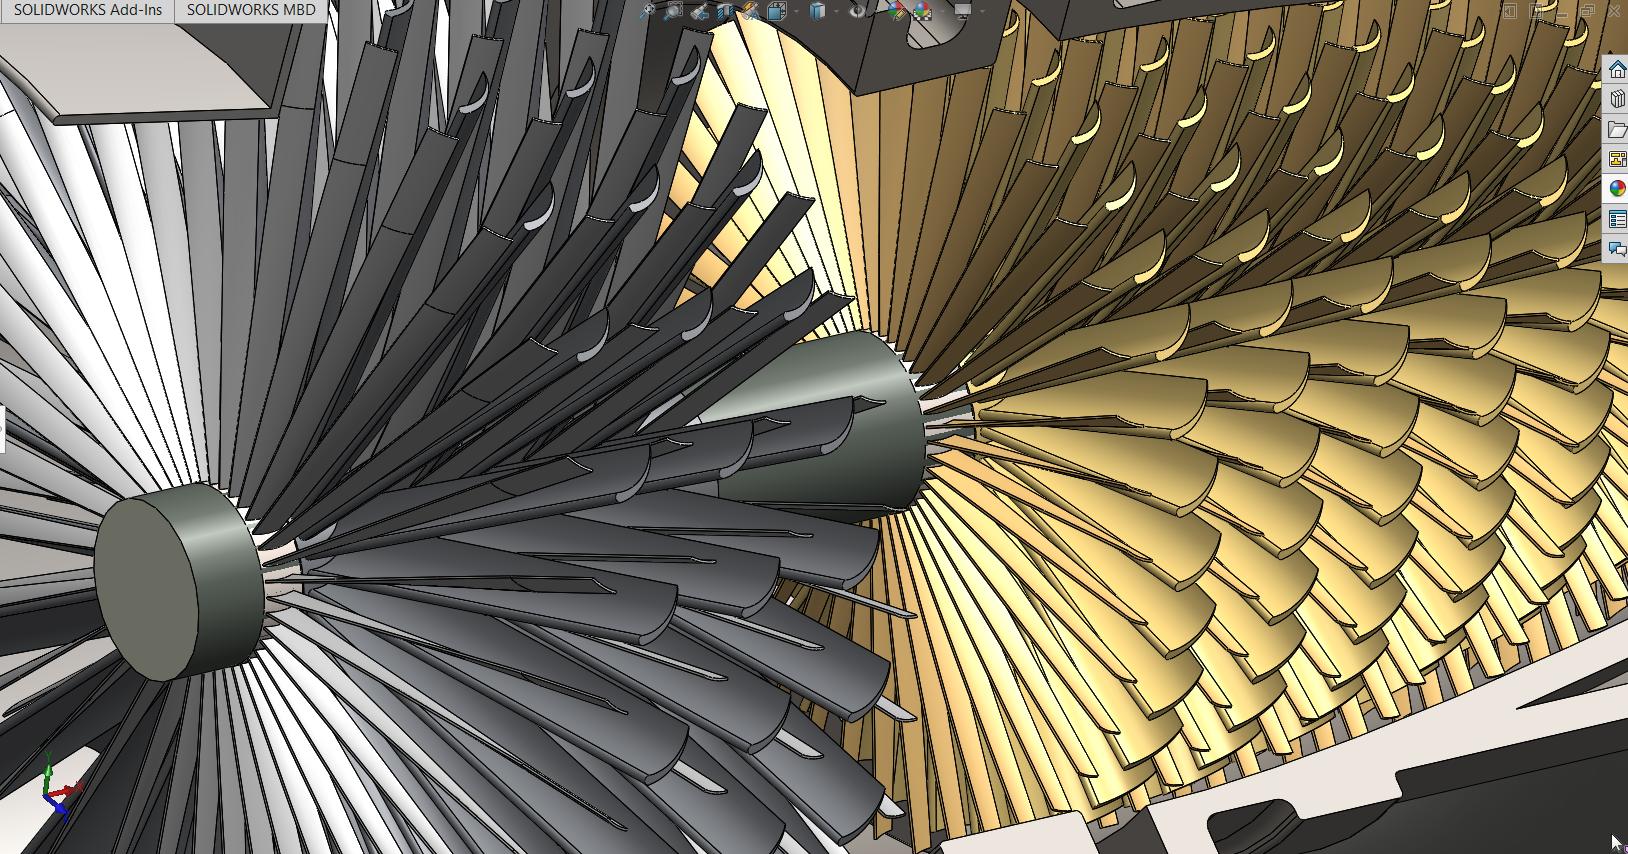 gas-turbine-sgt燃气轮机3D数模图纸